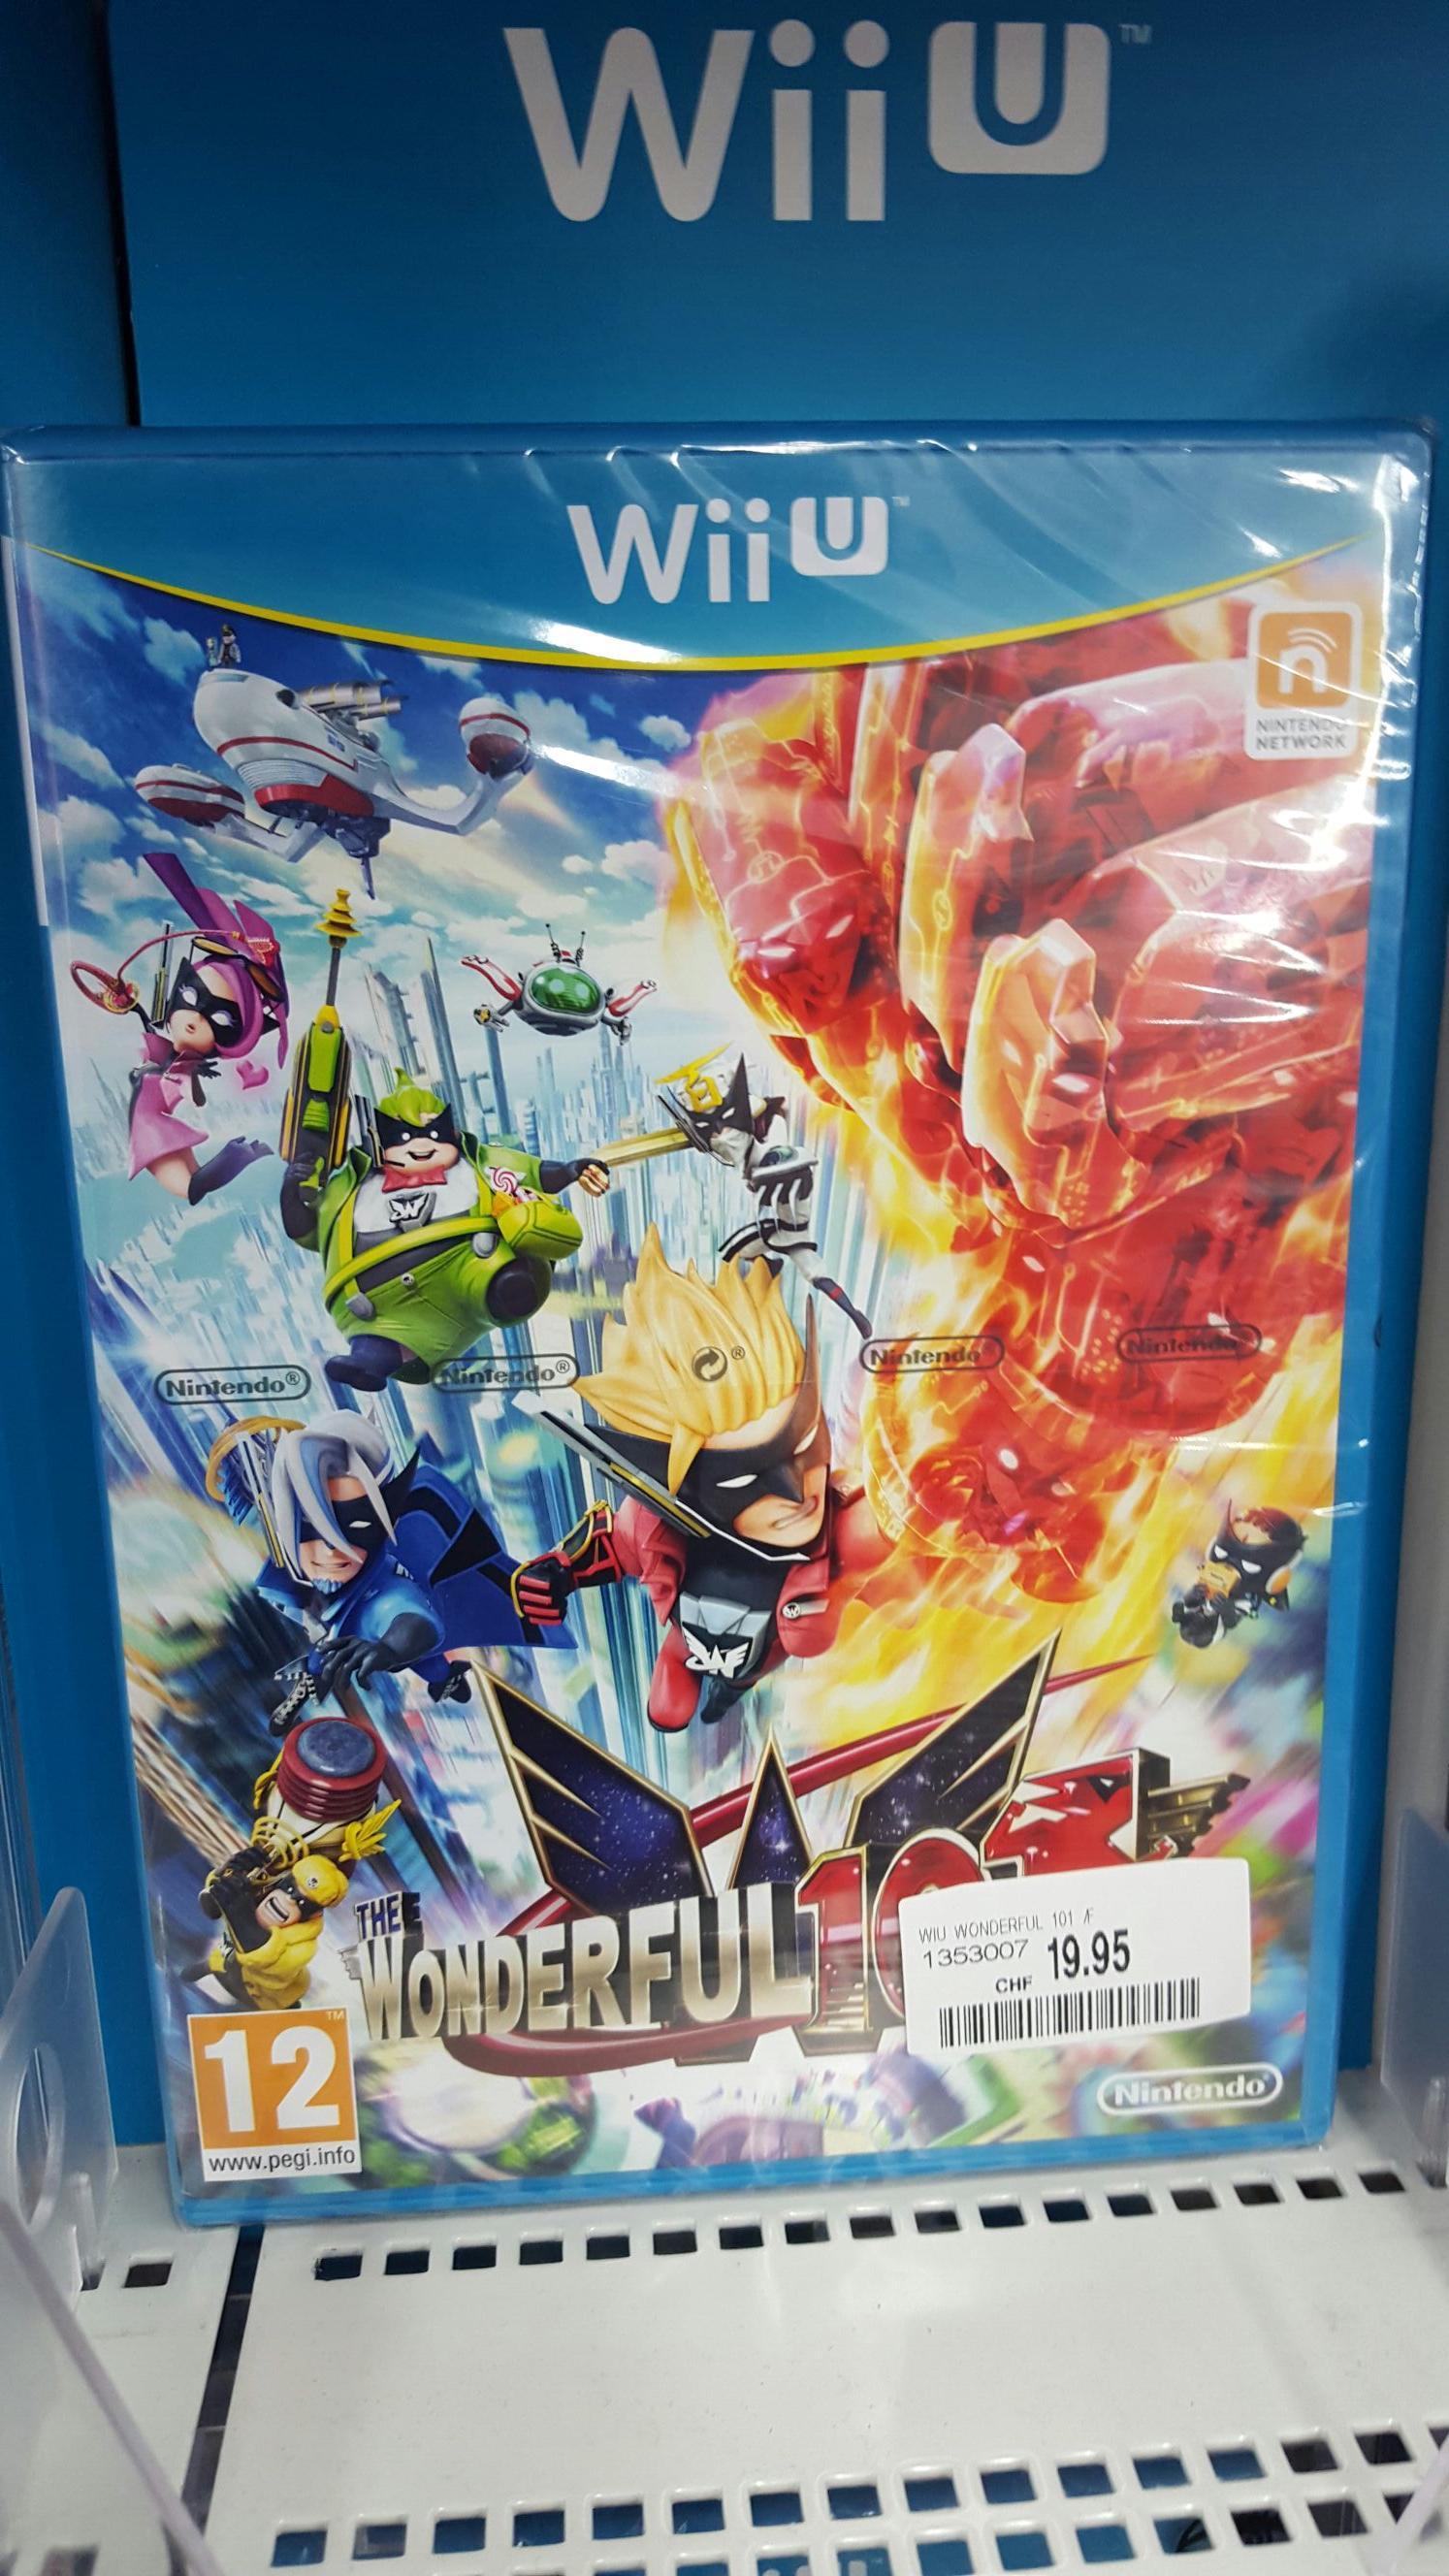 Jeu The wonderful 101 sur Wii U